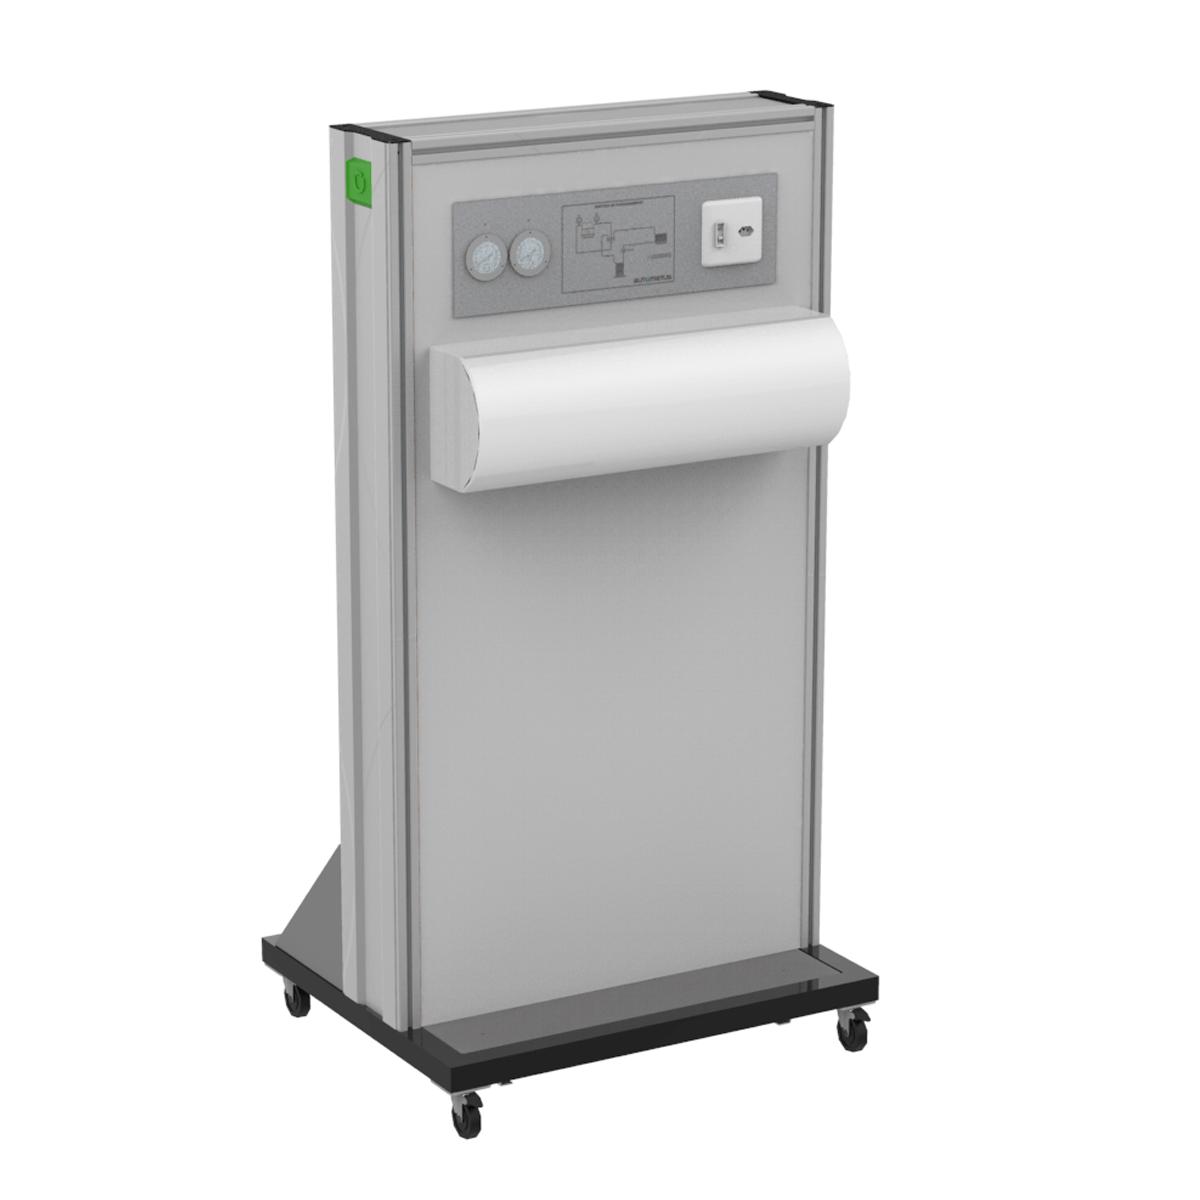 lab-de-ar-condicionado-simulador-de-defeitos-condicionador-de-ar-split-hi-wall-auttom-2